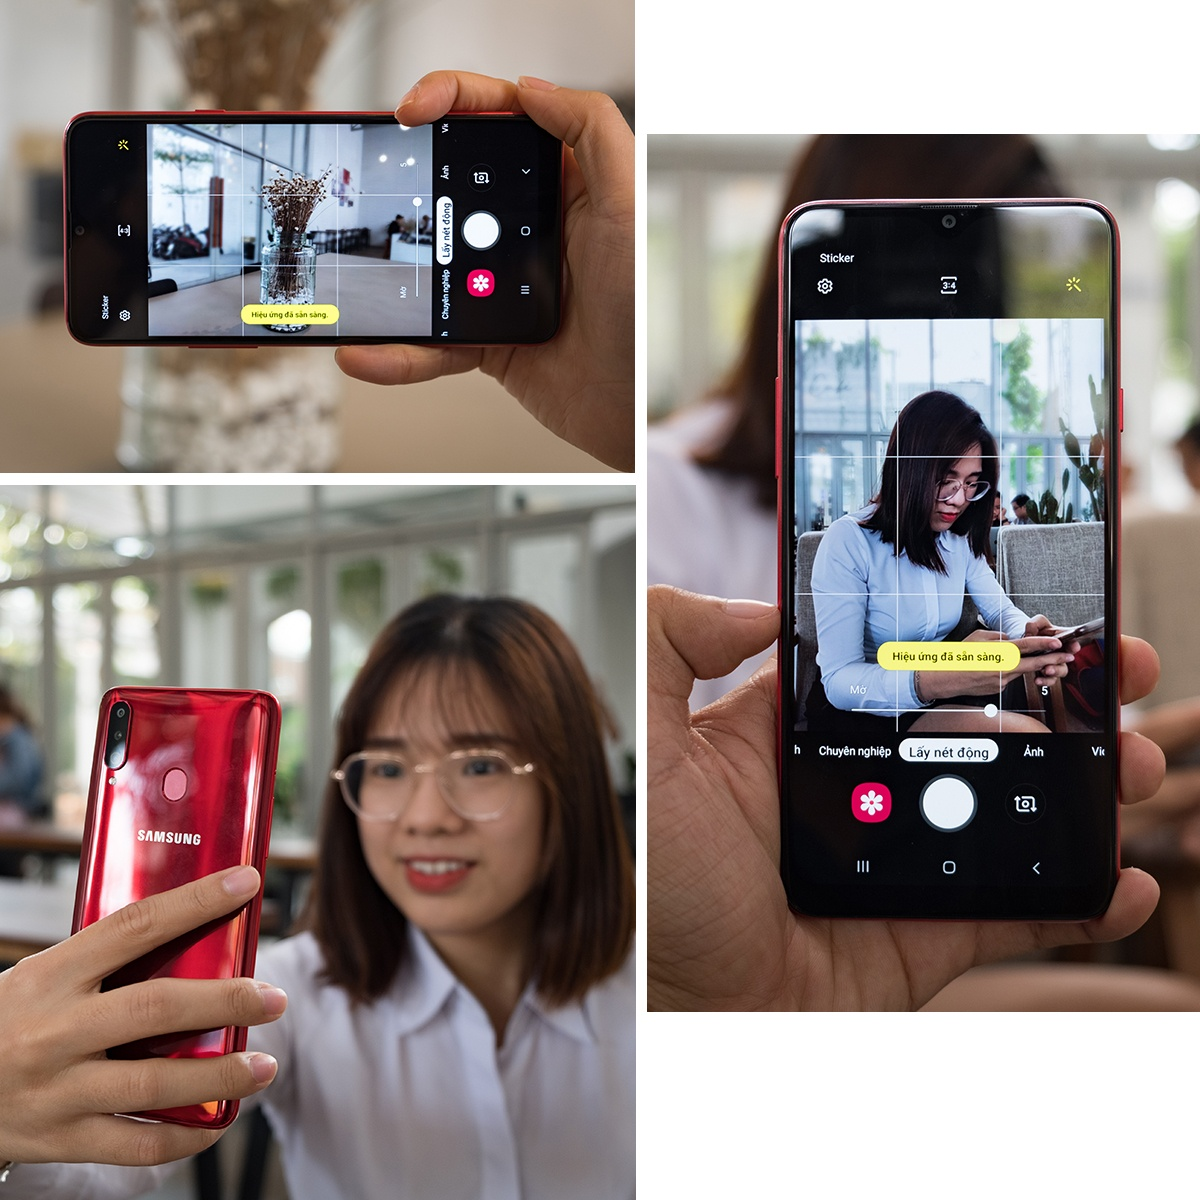 Smartphone pho thong phai co nhung dieu nay moi chieu duoc nguoi dung hinh anh 5